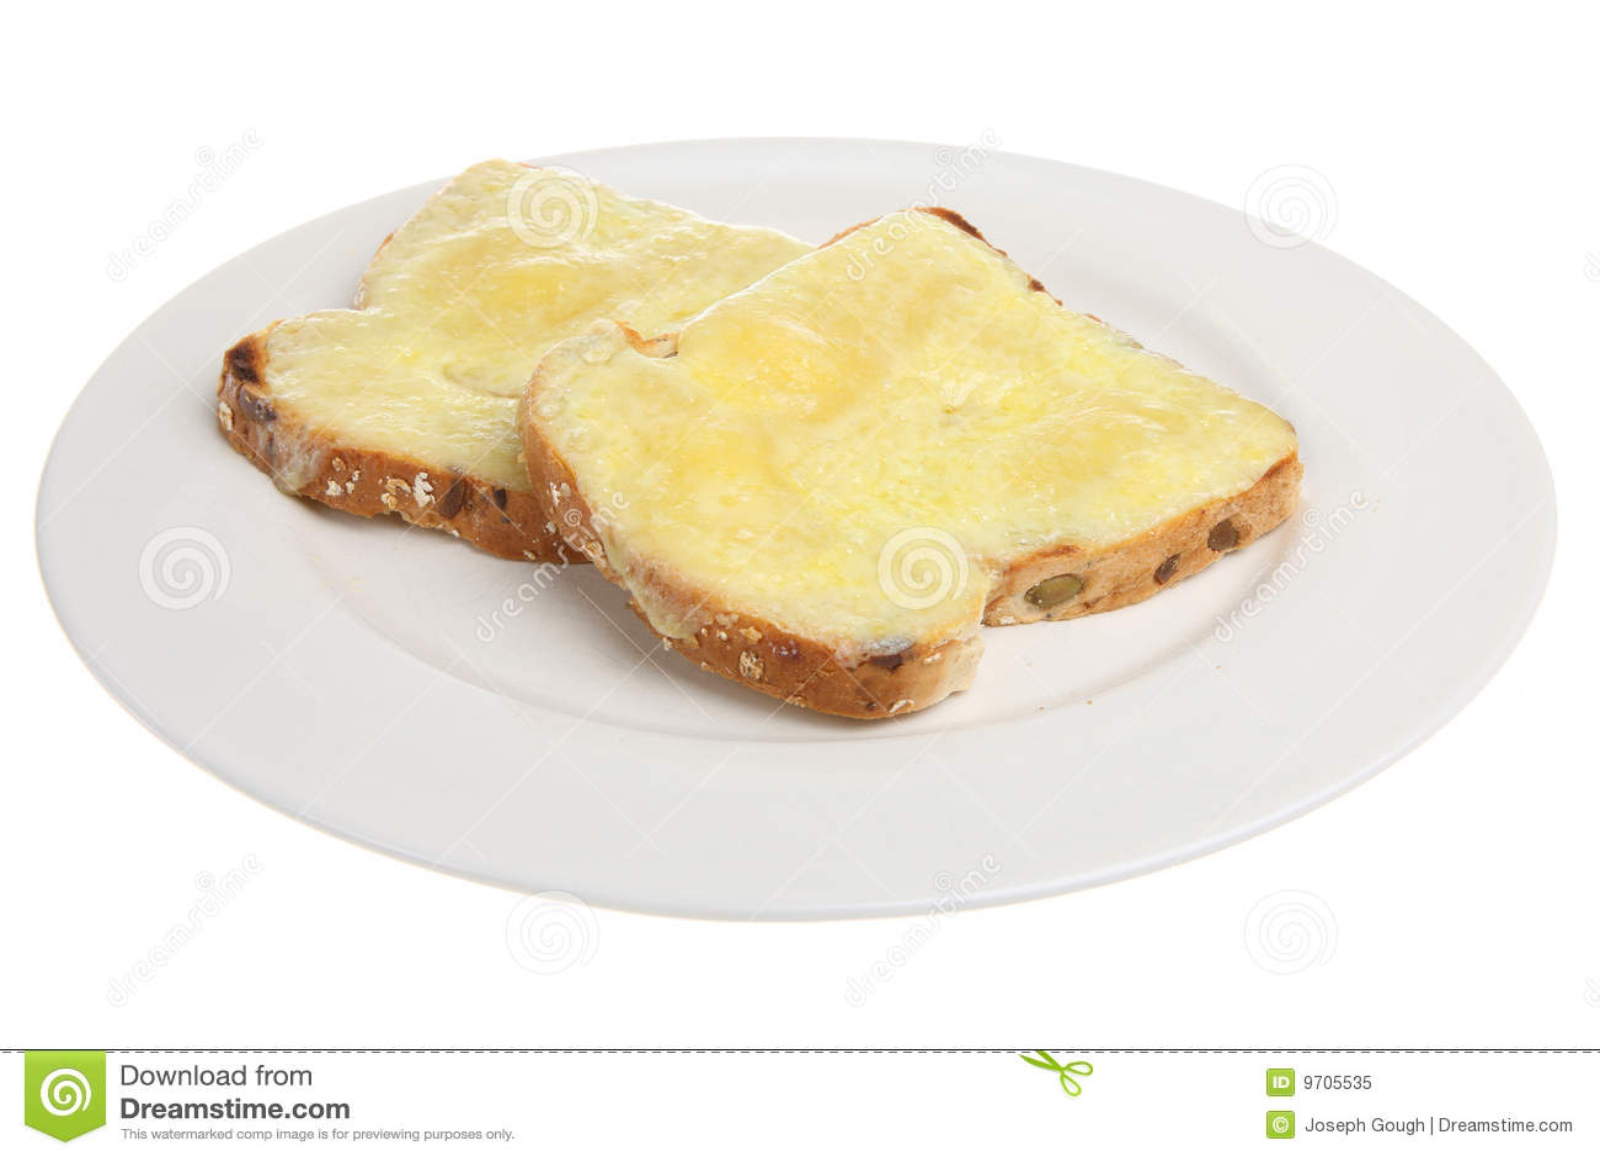 cheese-toast-9705535.jpg